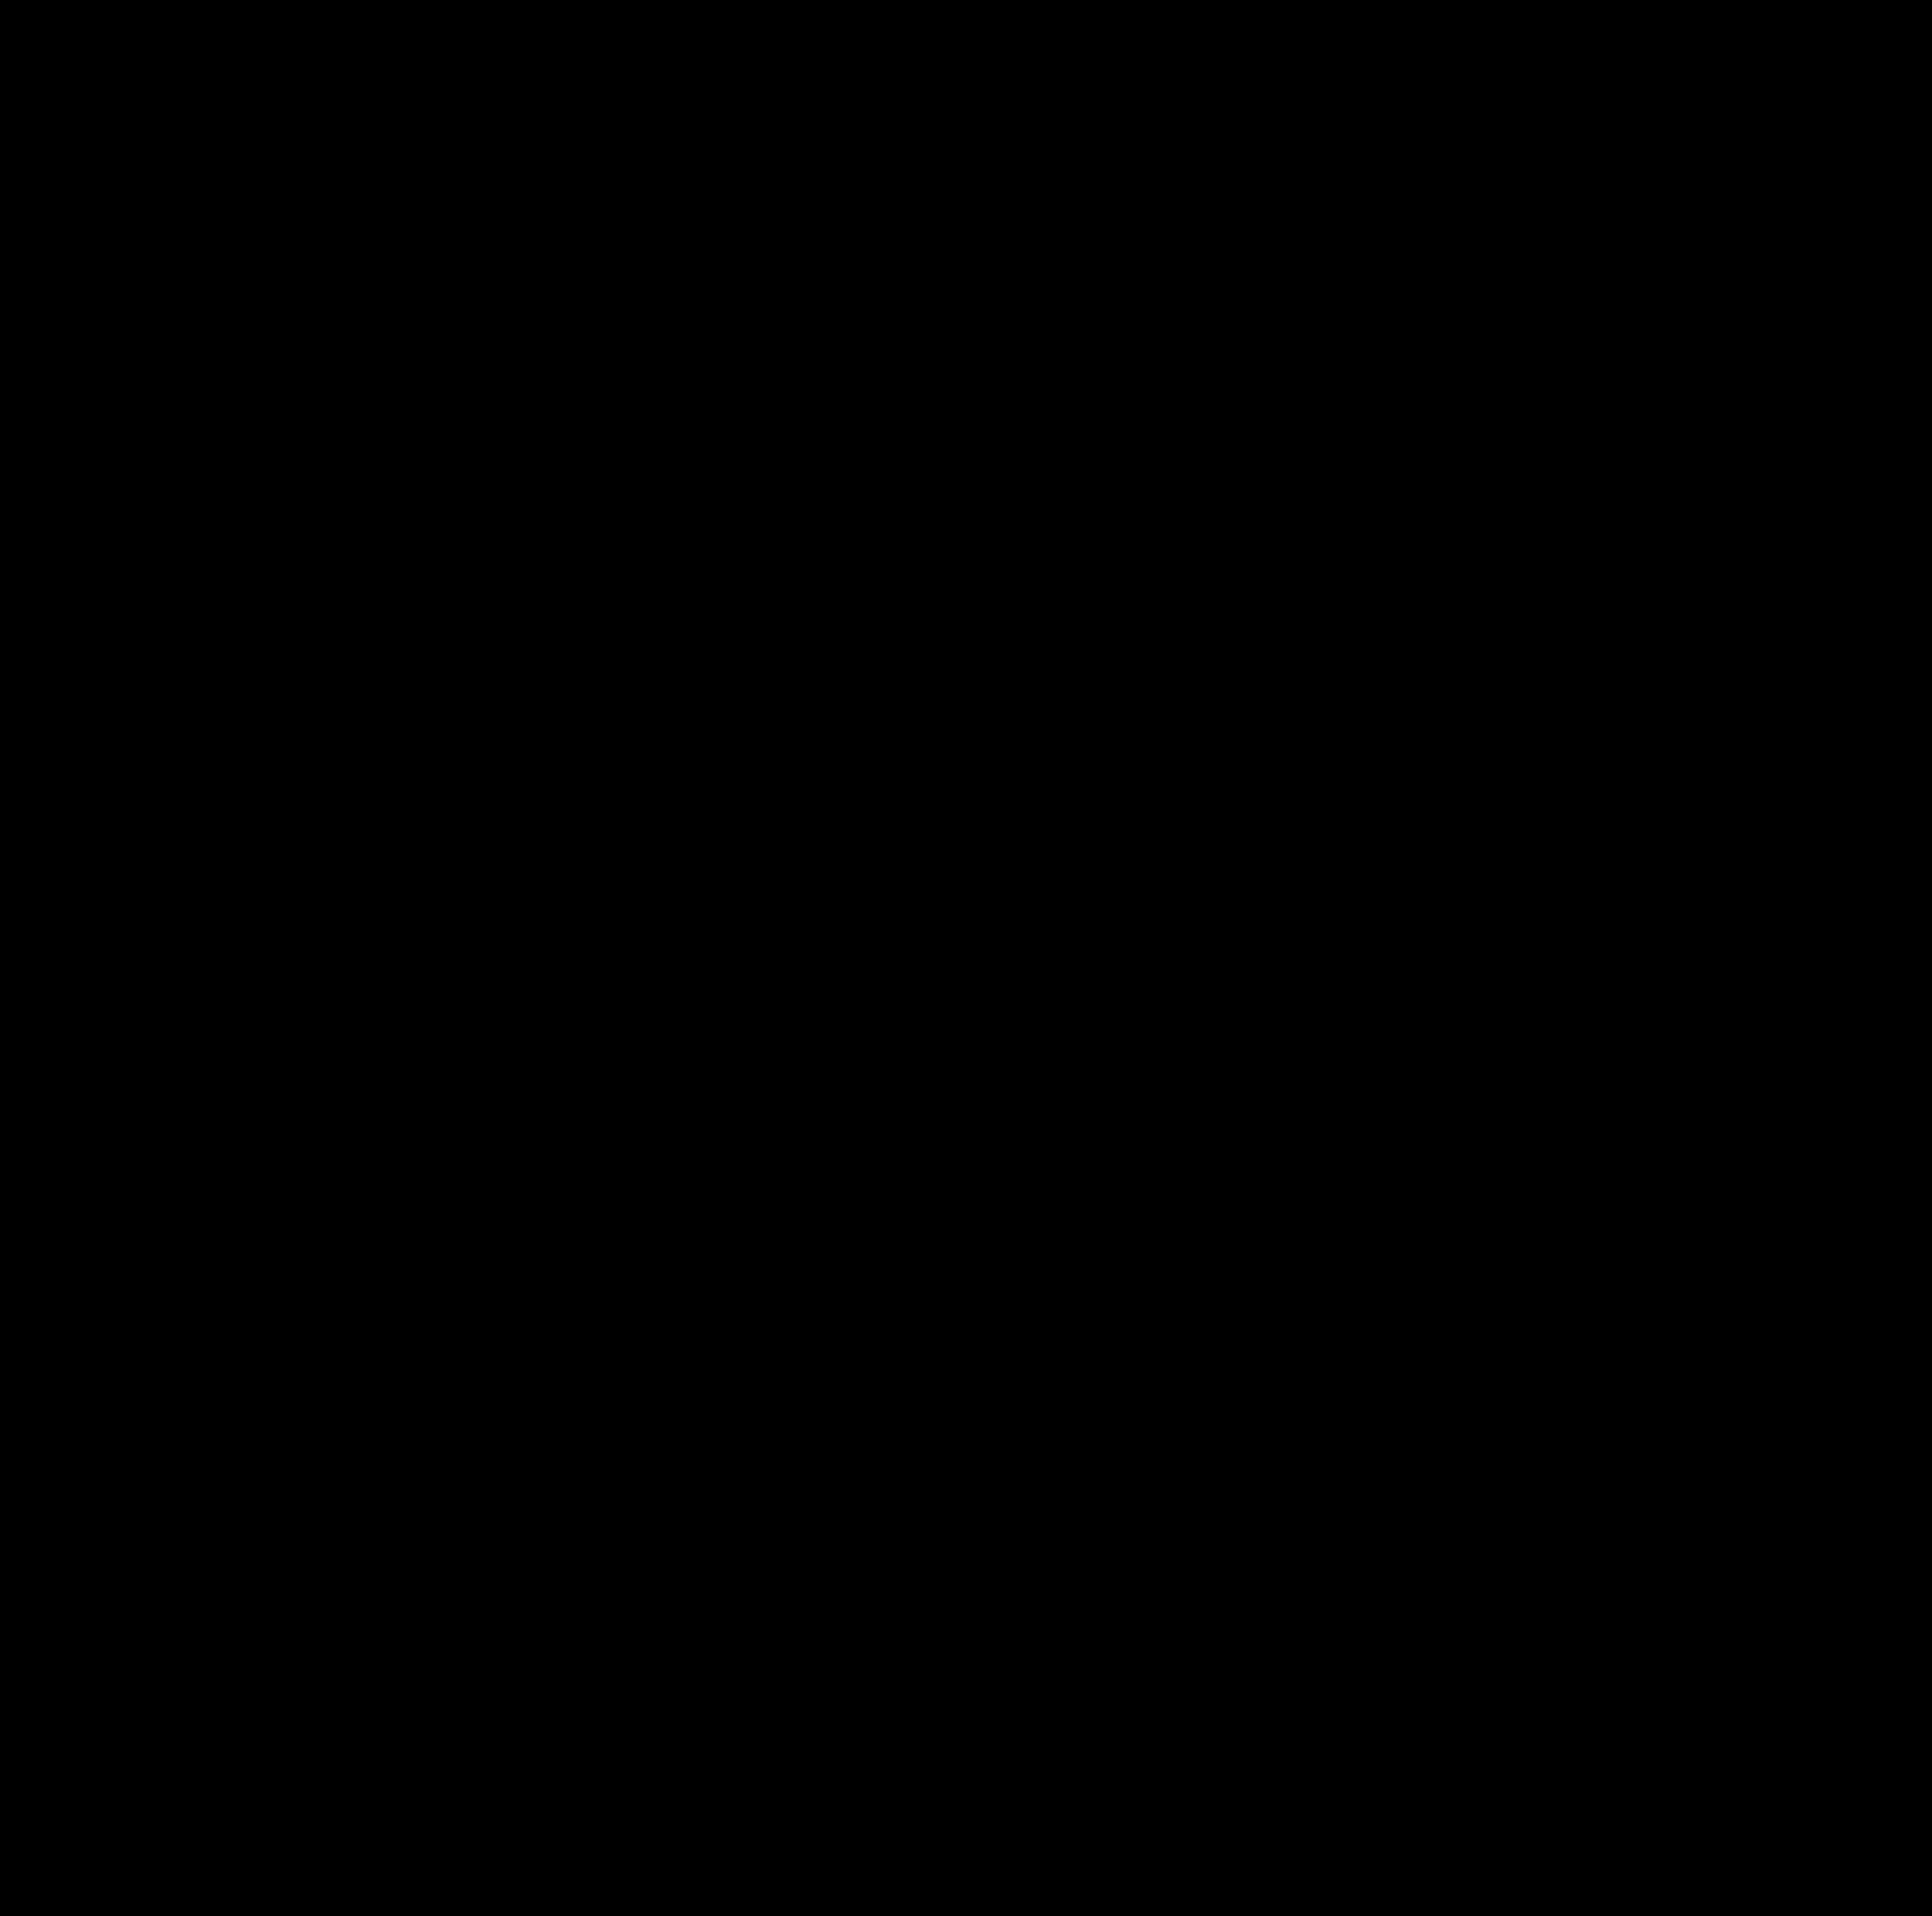 Converse clipart show (PNG) stiefel IMAGE BIG Clipart